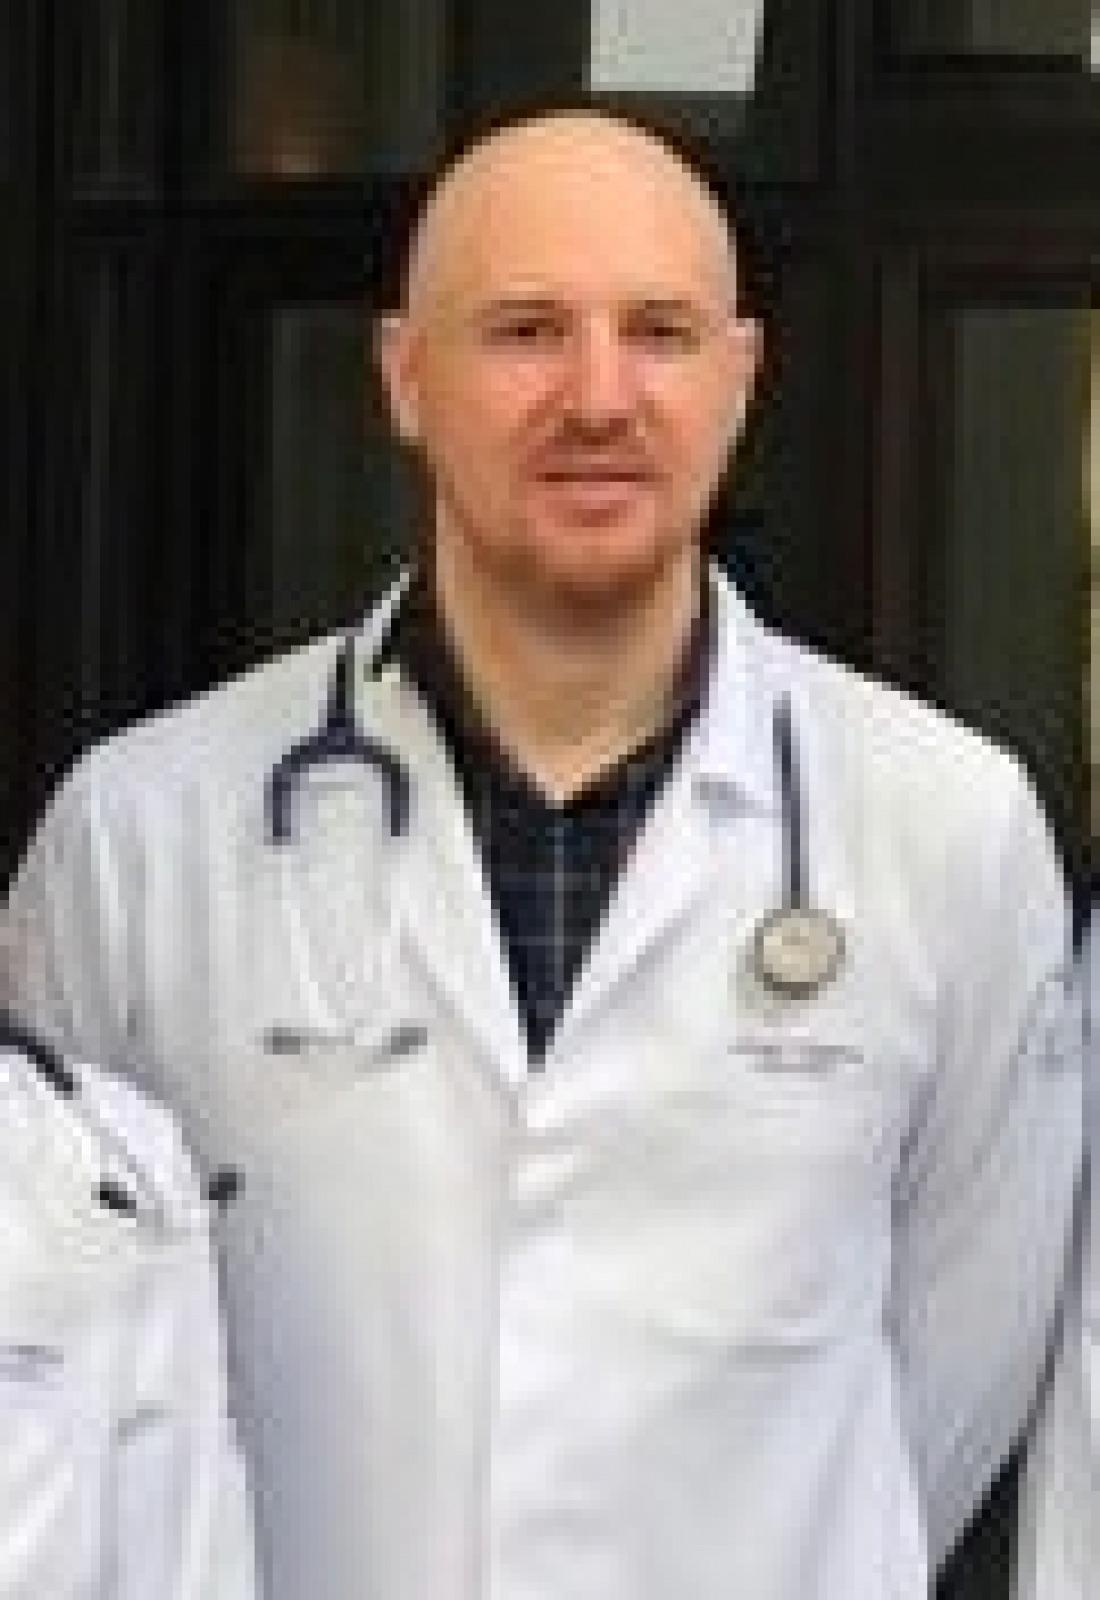 Dr Jorge Bordon Aguero